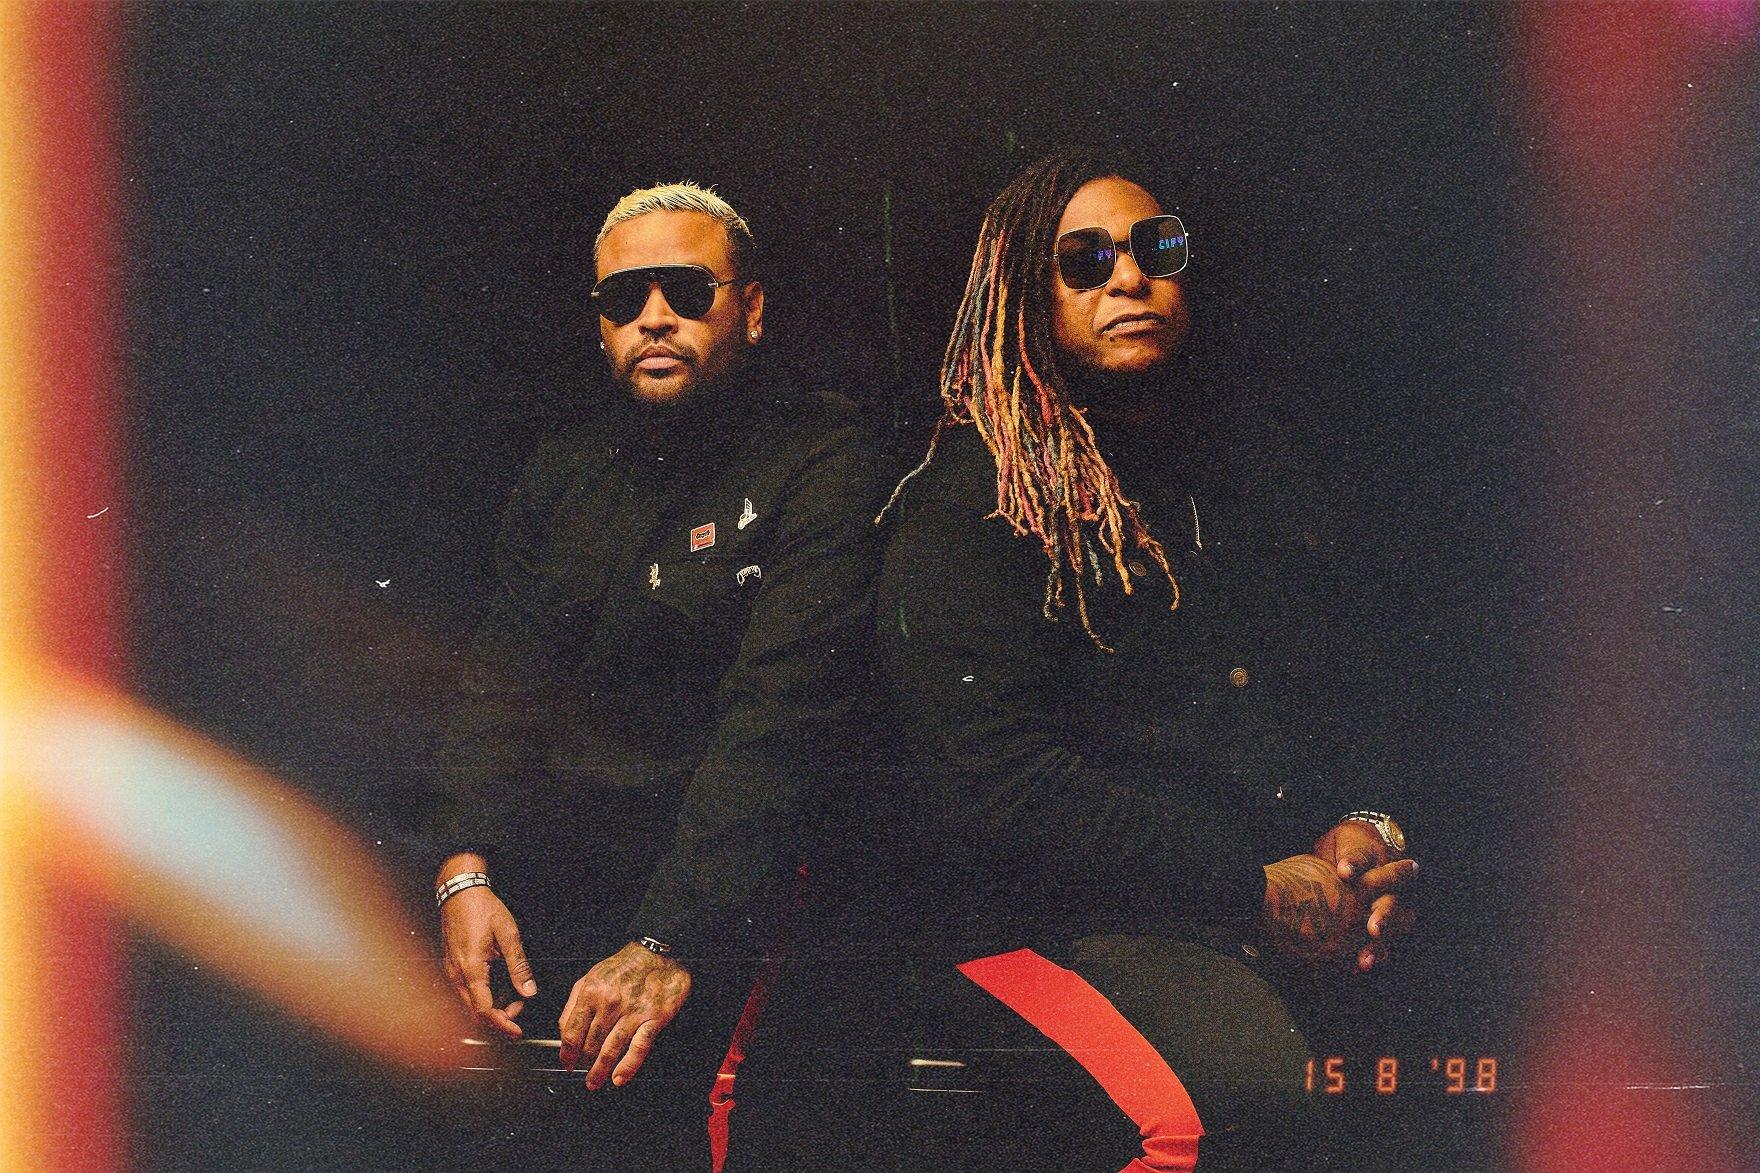 Zion & Lennox, presentaron su nuevo tema / Alejandro Barrera/ Warner Music